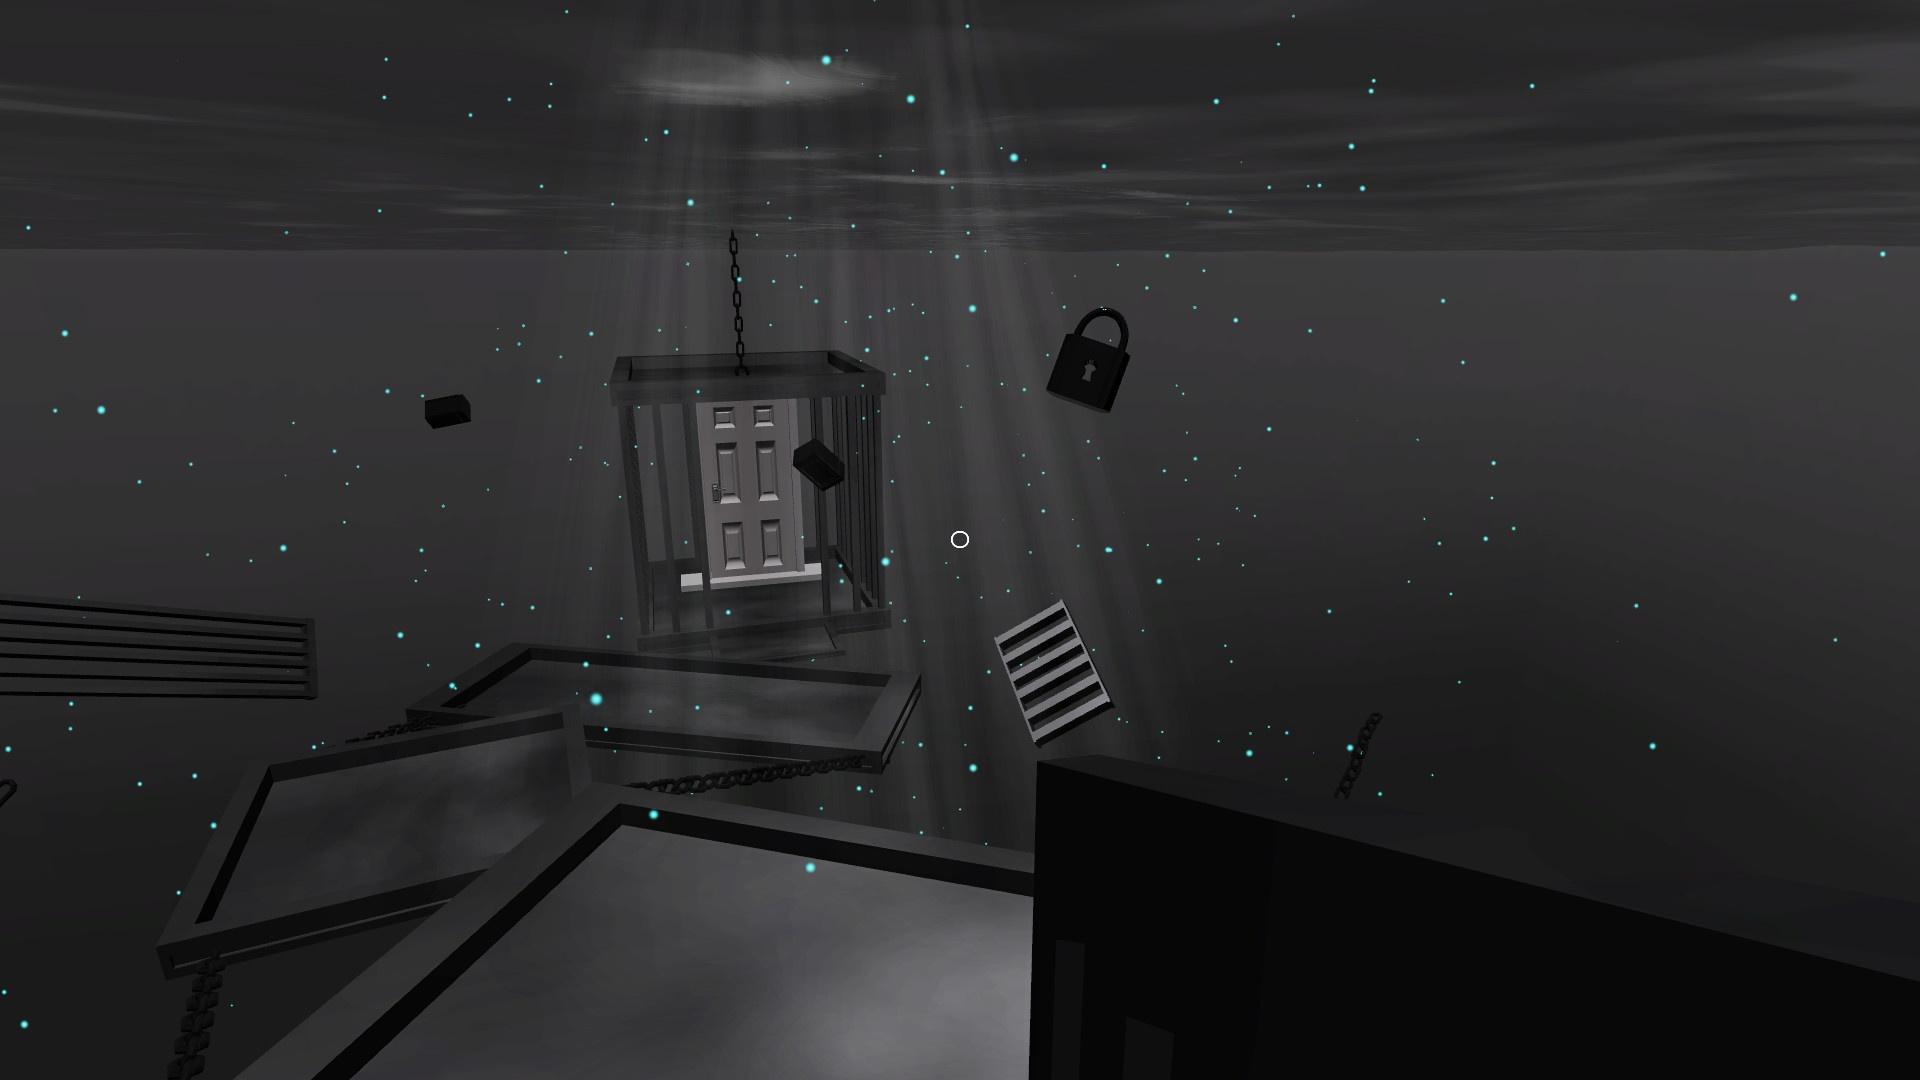 Вышла Fractured Minds, игра 17-летней лауреатки BAFTA Young Games Designers